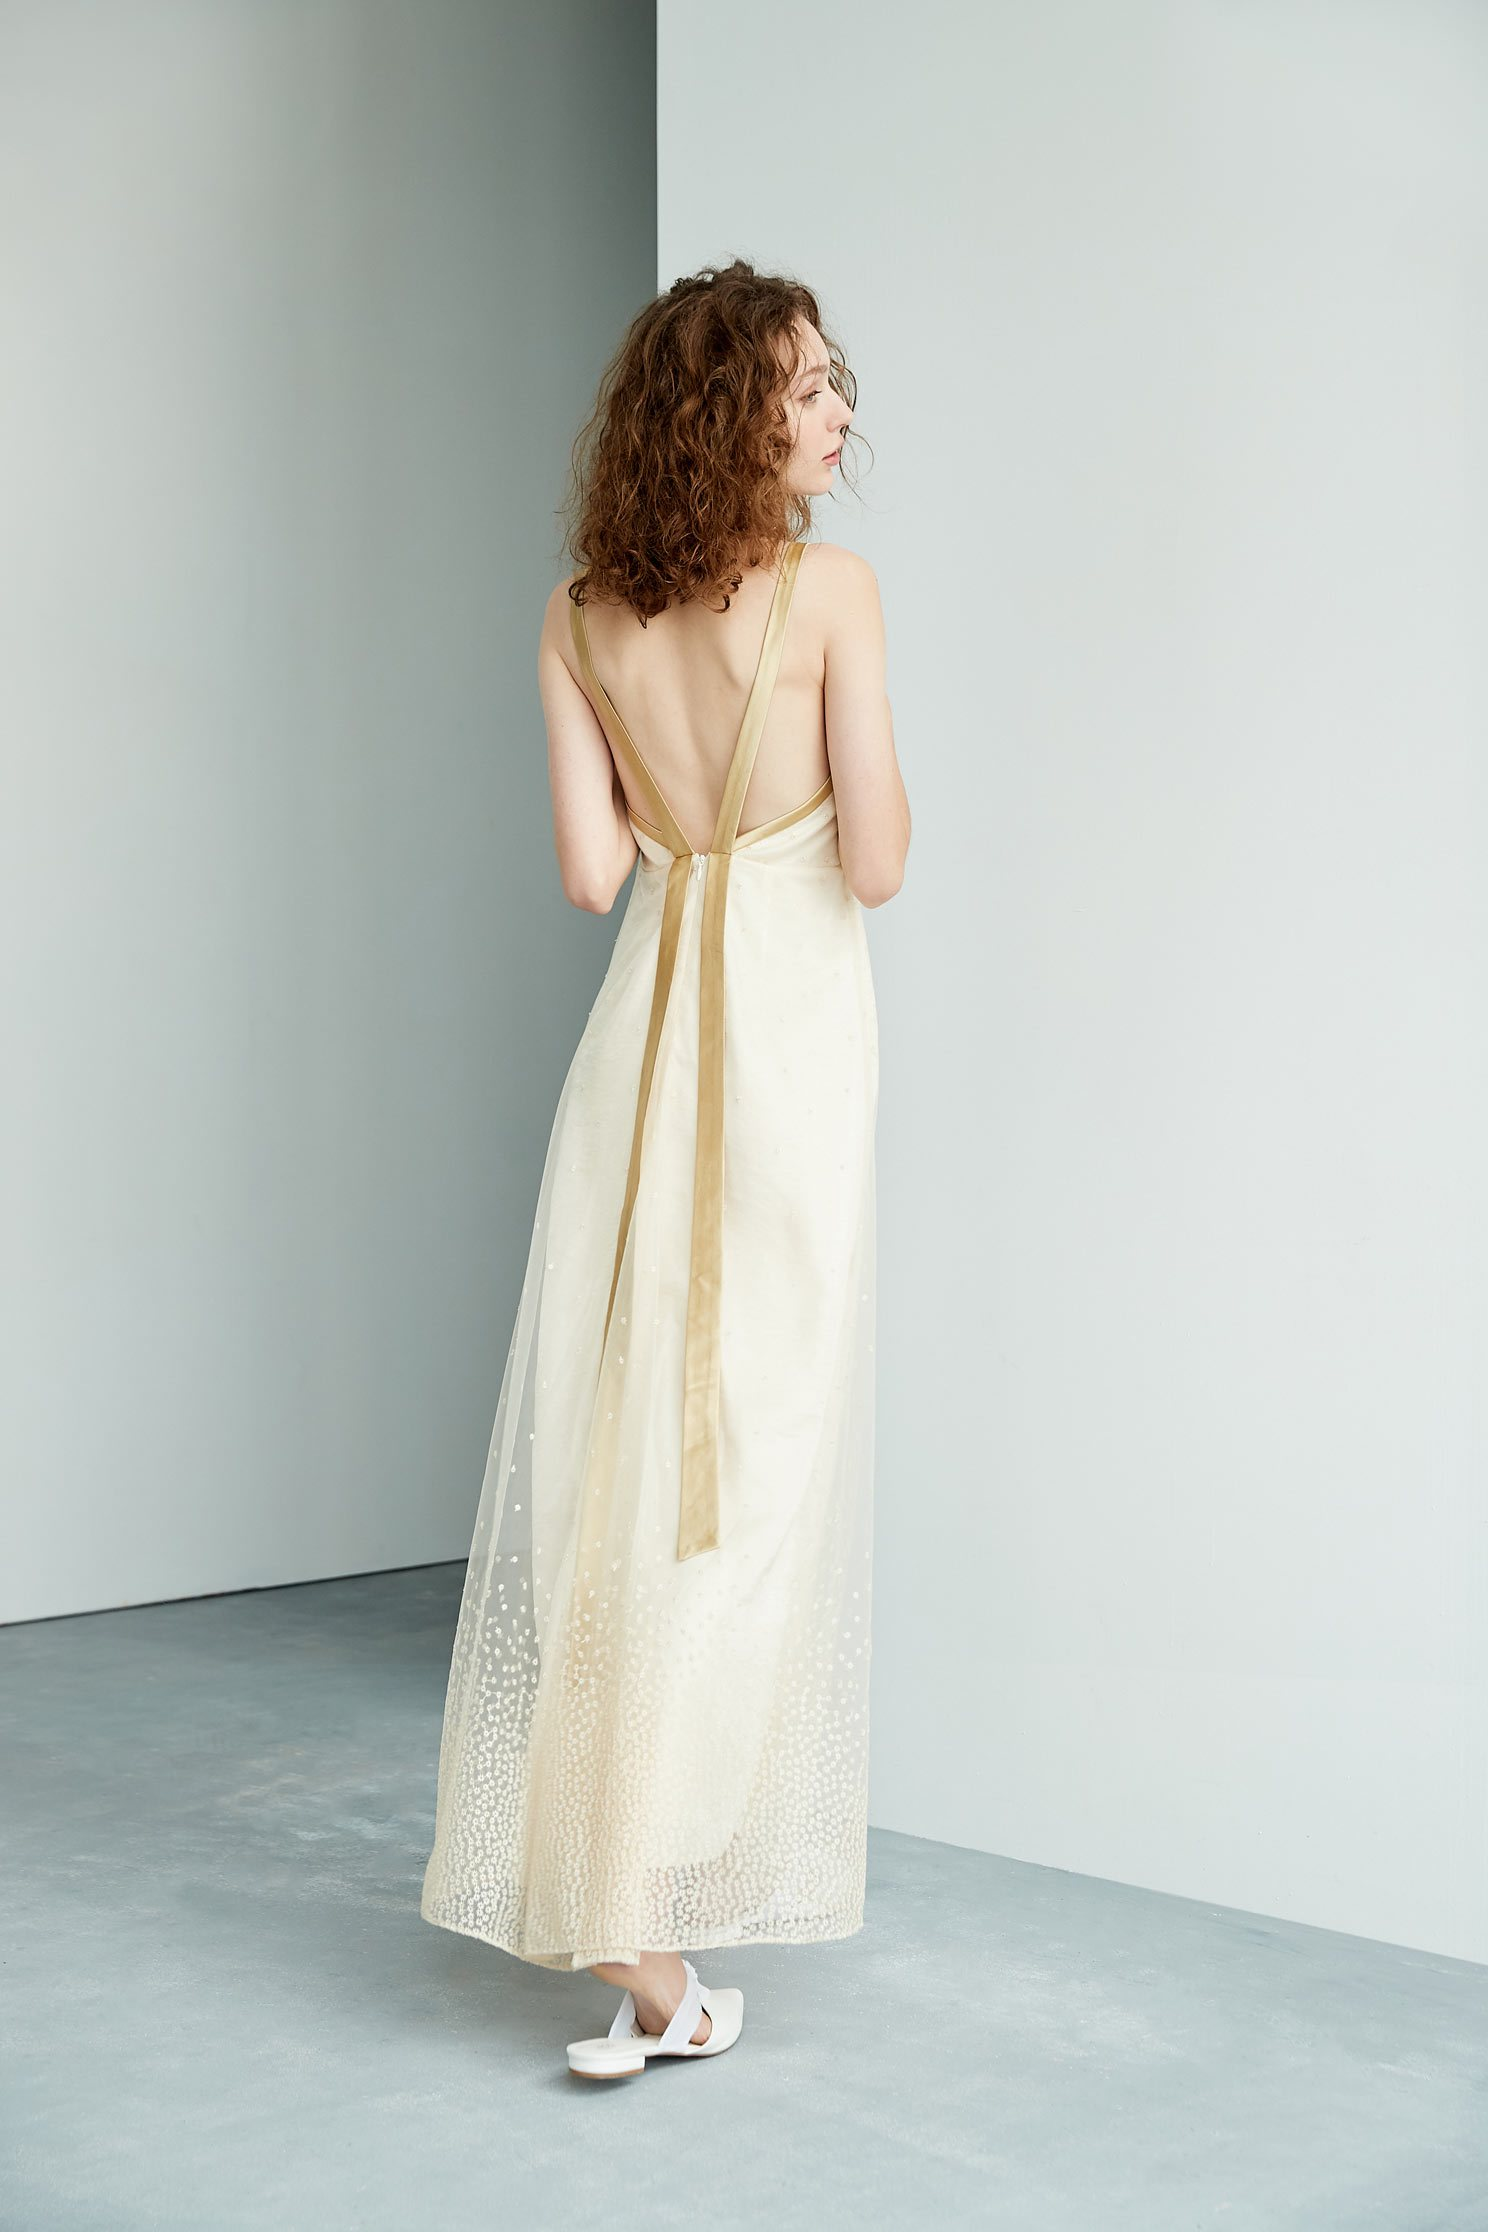 Elegant and gorgeous dress,boatneckdress,embroidery,embroiderddress,cocktaildress,sleevelessdress,eveningwear,spaghettistrap,spaghettistrapdress,embroidered